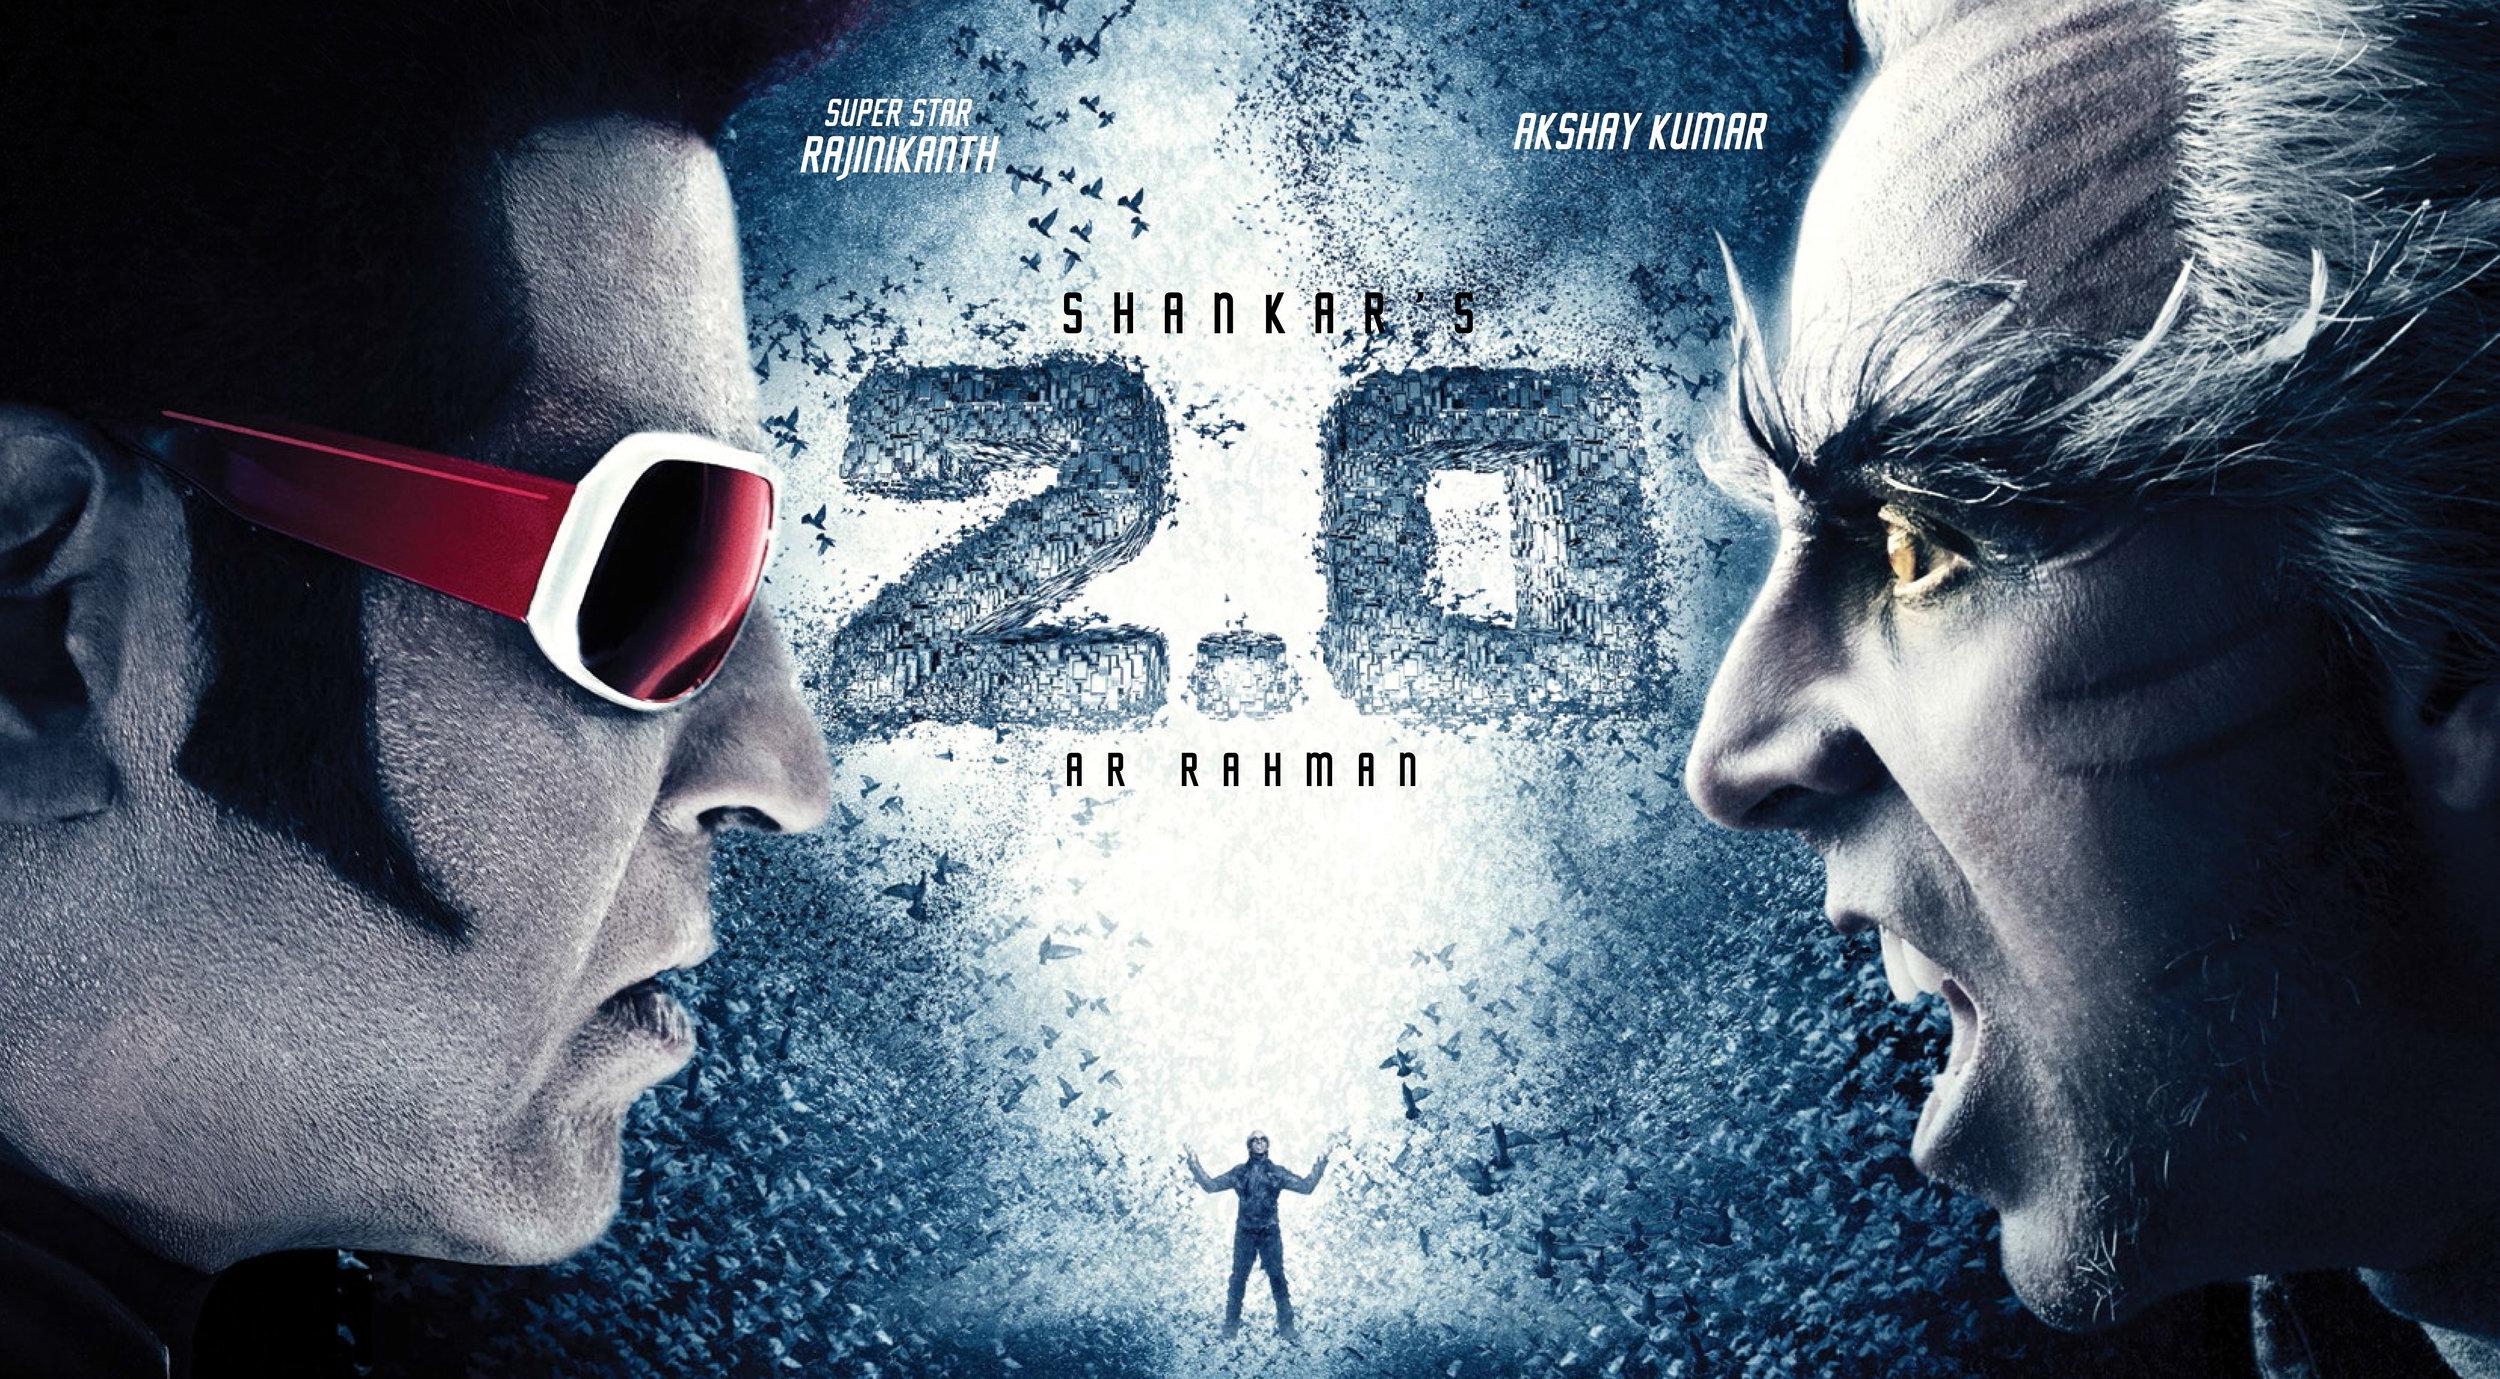 2.0    Credits:    Director  - S. Shankar   Productions  - Lyca Productions   Additional VFX  - Dark Cosmos Creative   VFX Supervisor  - Jeremy Hardin   Additional Compositing  - Elizabeth Boyle